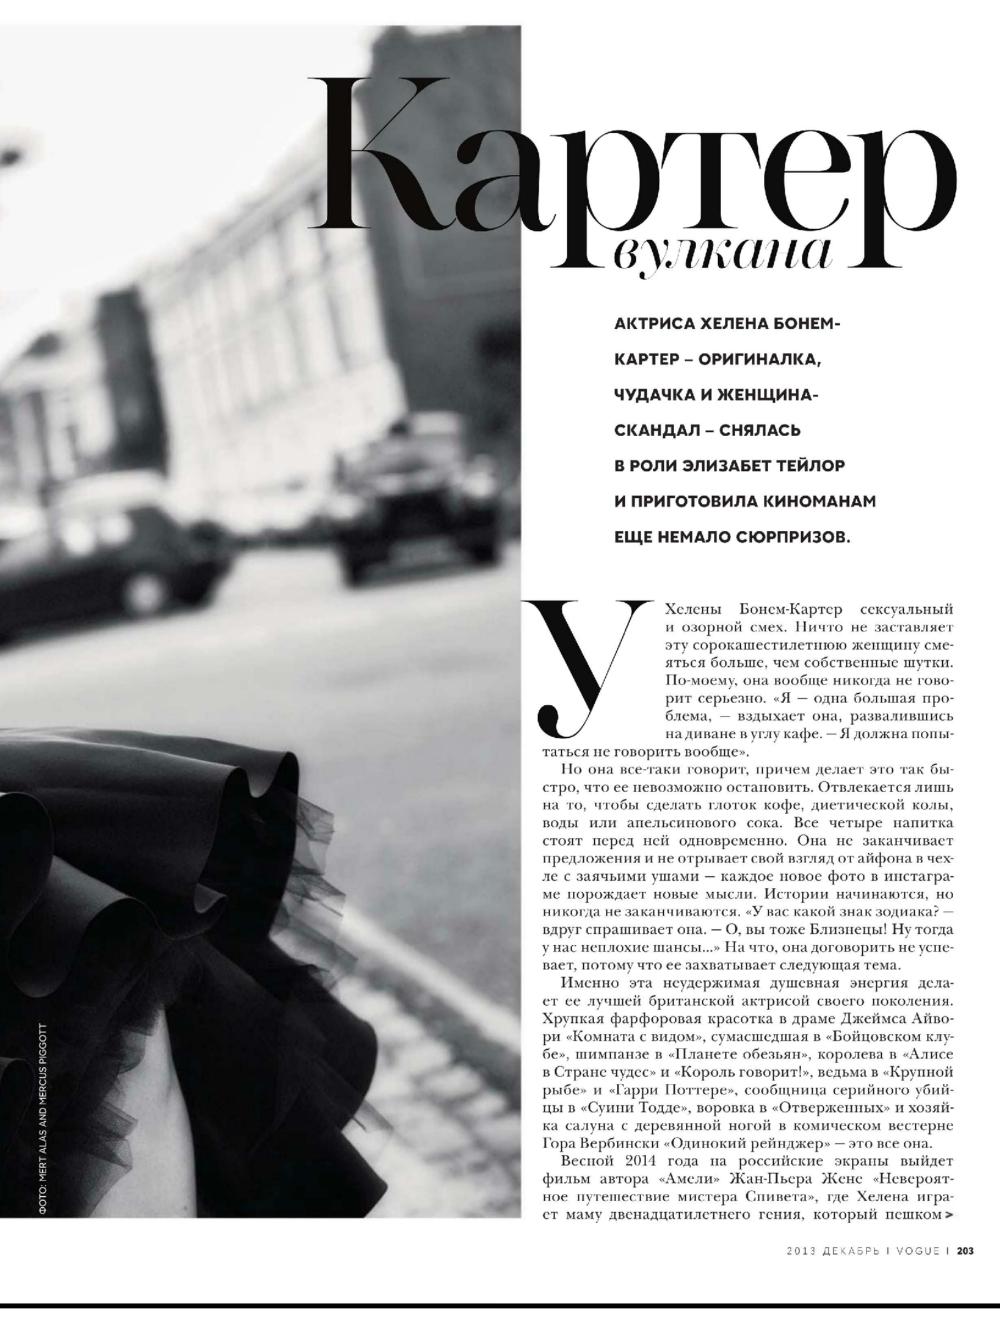 http://i6.imageban.ru/out/2013/12/06/a58b260fd763716965857fdbb4940b21.jpg